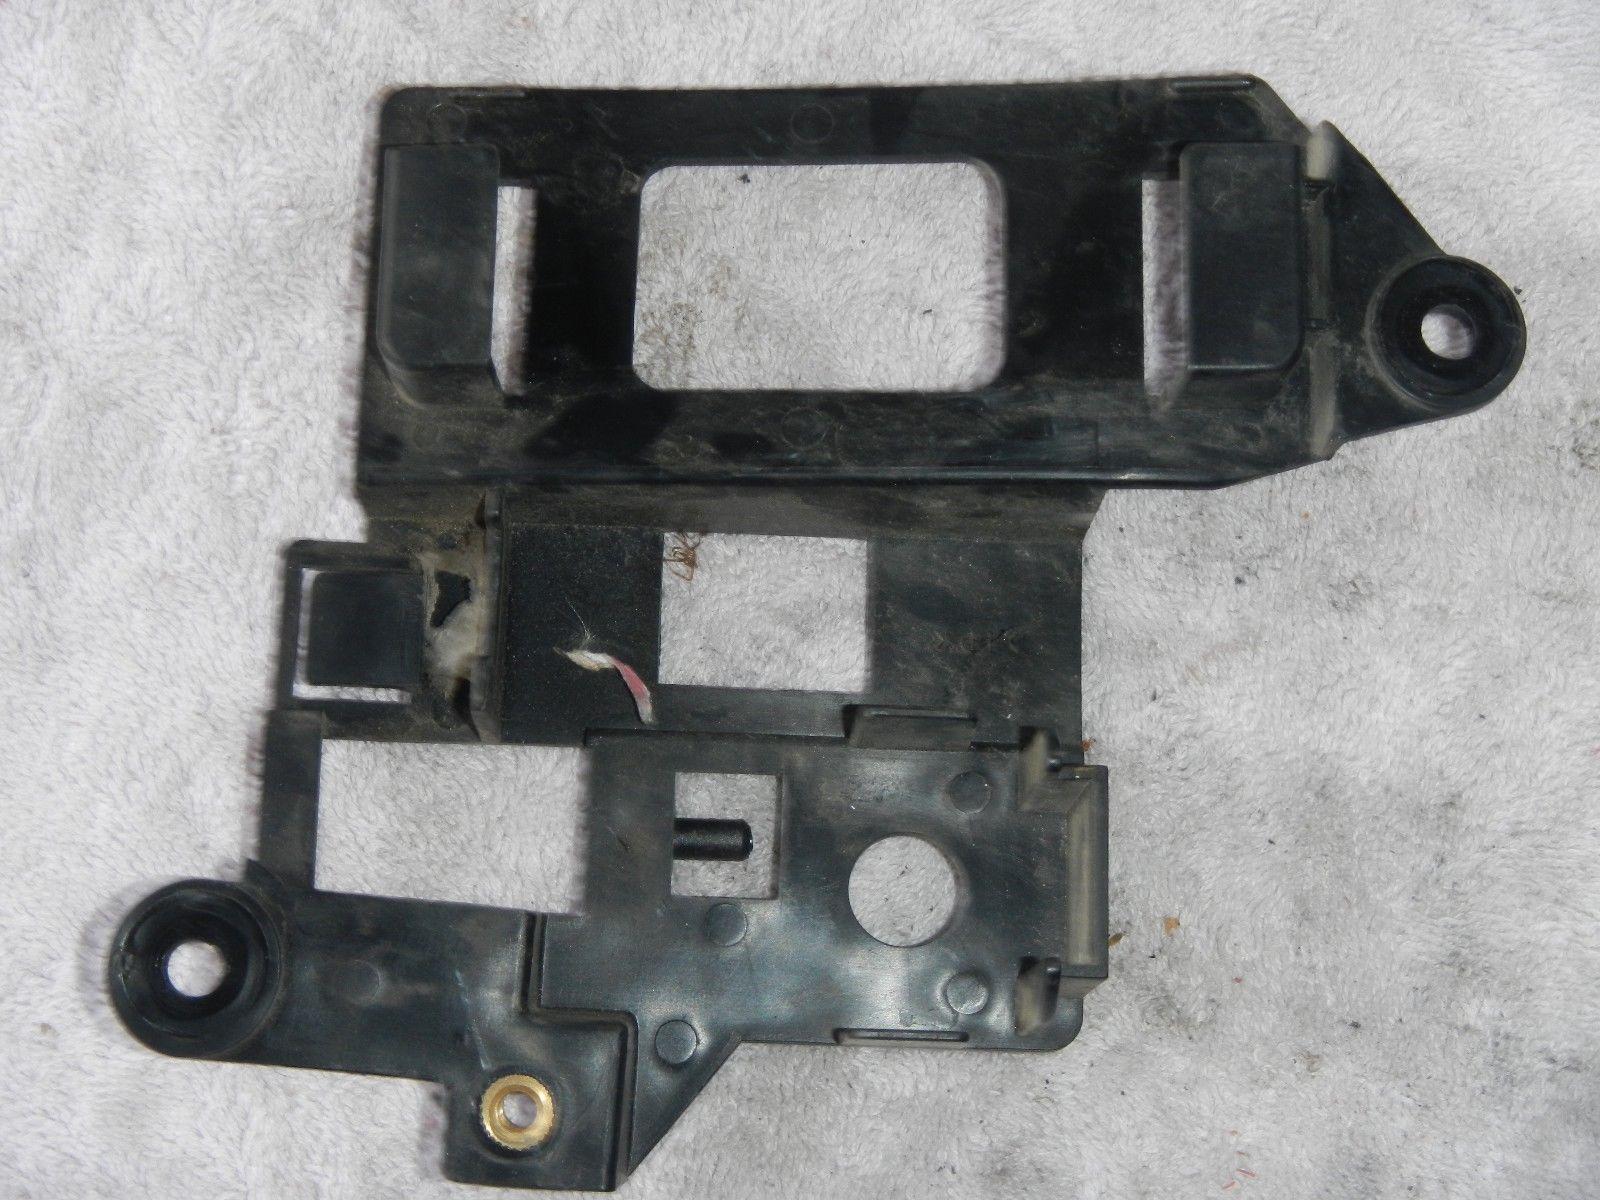 hight resolution of fuse box housing junction box mount bracket 2007 kawasaki ninja 250 ex250 ex250f